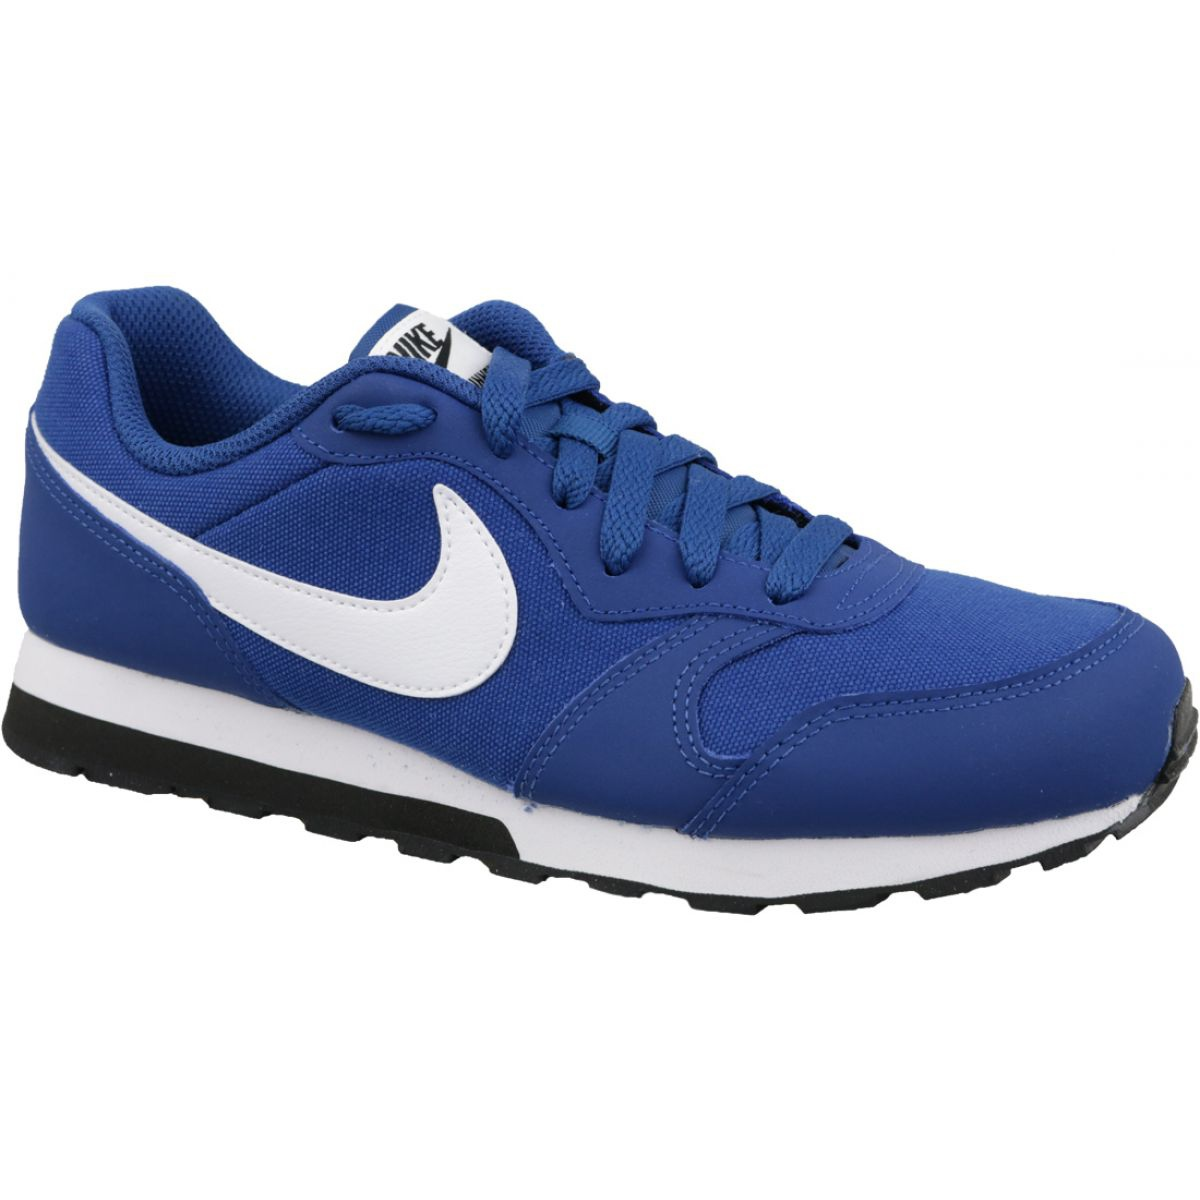 Sapatilhas Nike Md Runner 2 Gs Jr 807316 411 azul